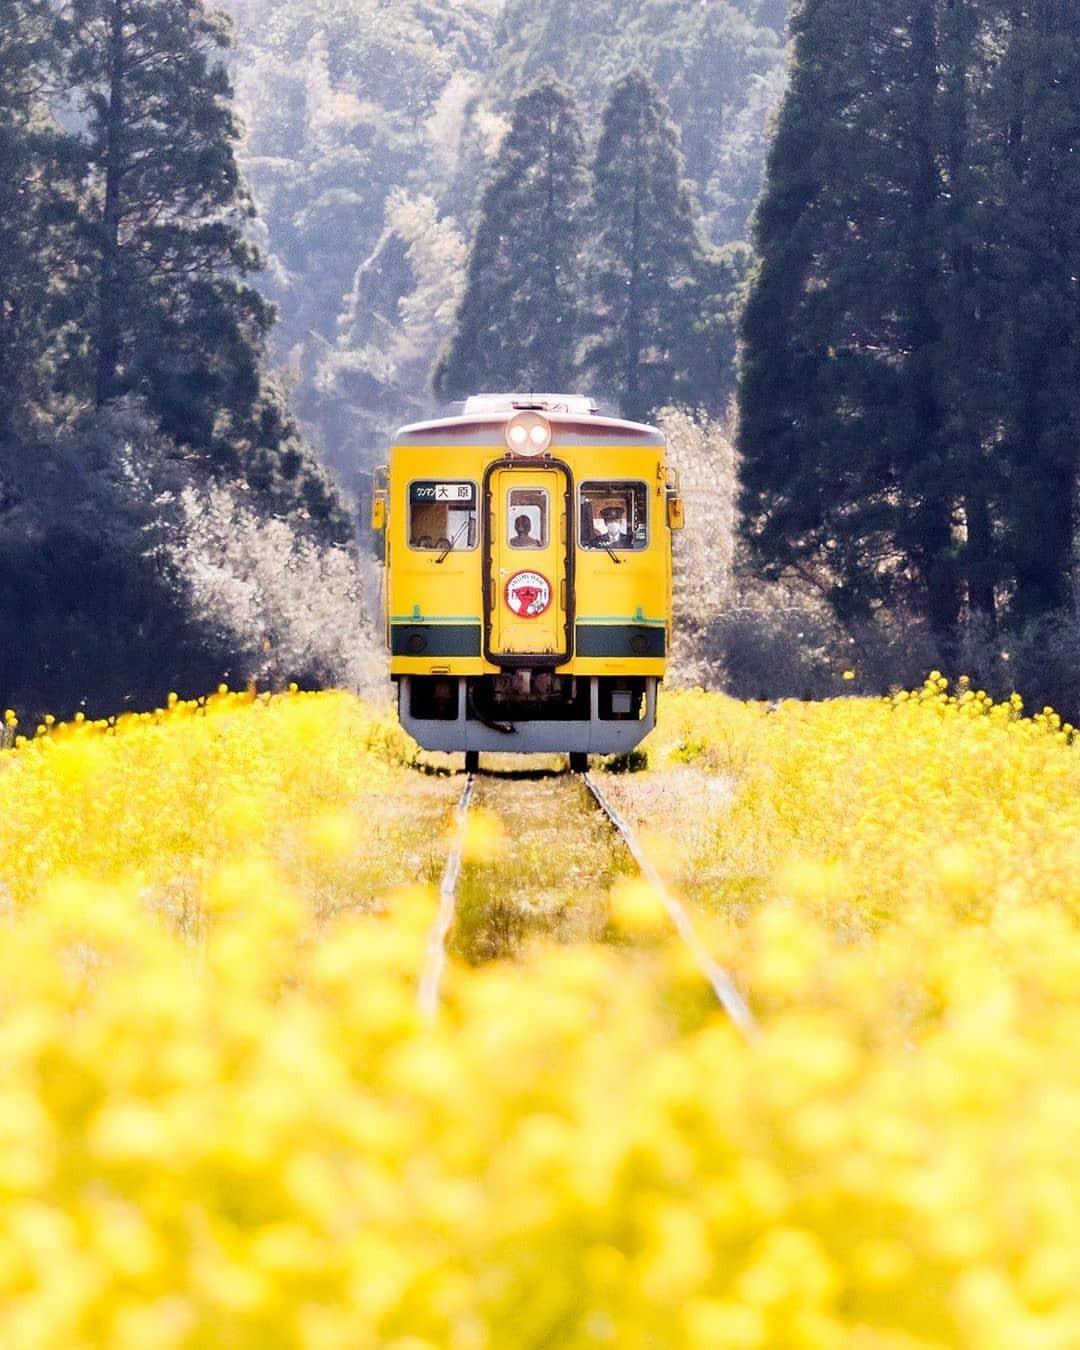 1080x1350, 204 Kb / желтый, вагон, поезд, поле, лес